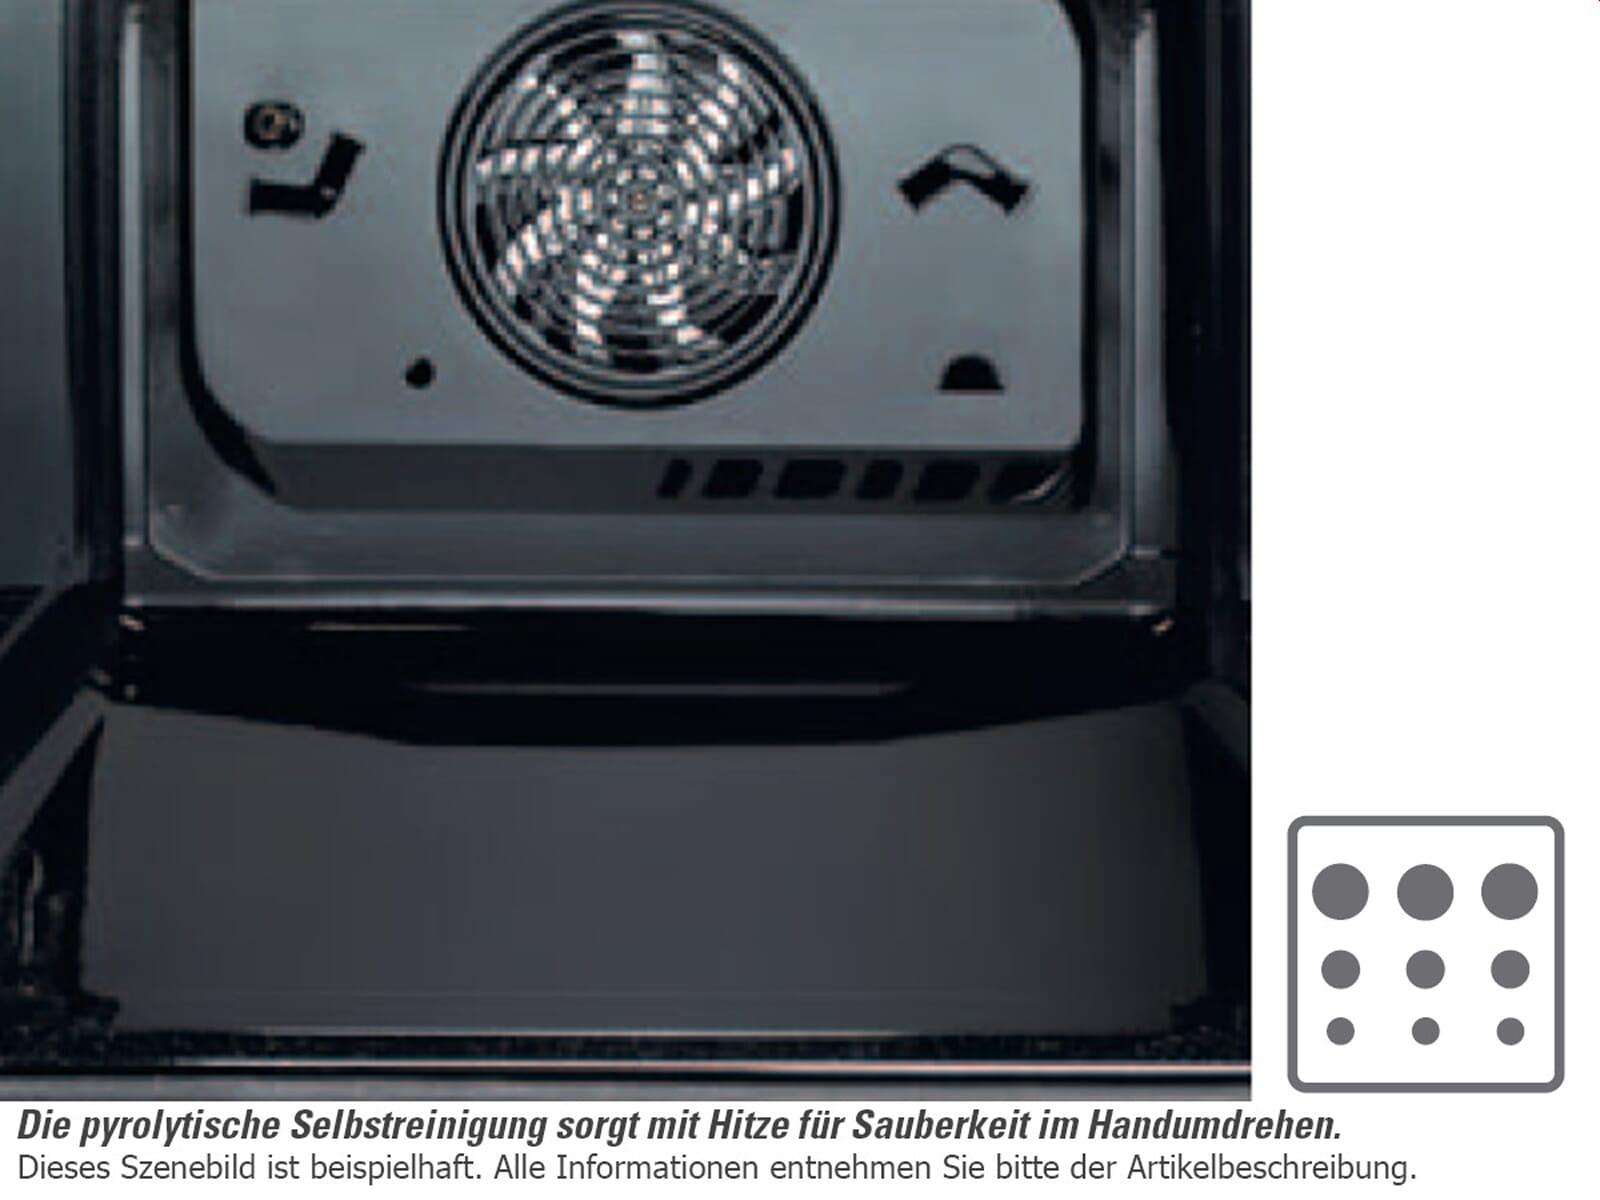 V-ZUG Combair XSEP Pyrolyse Kompakt Backofen ChromeClass